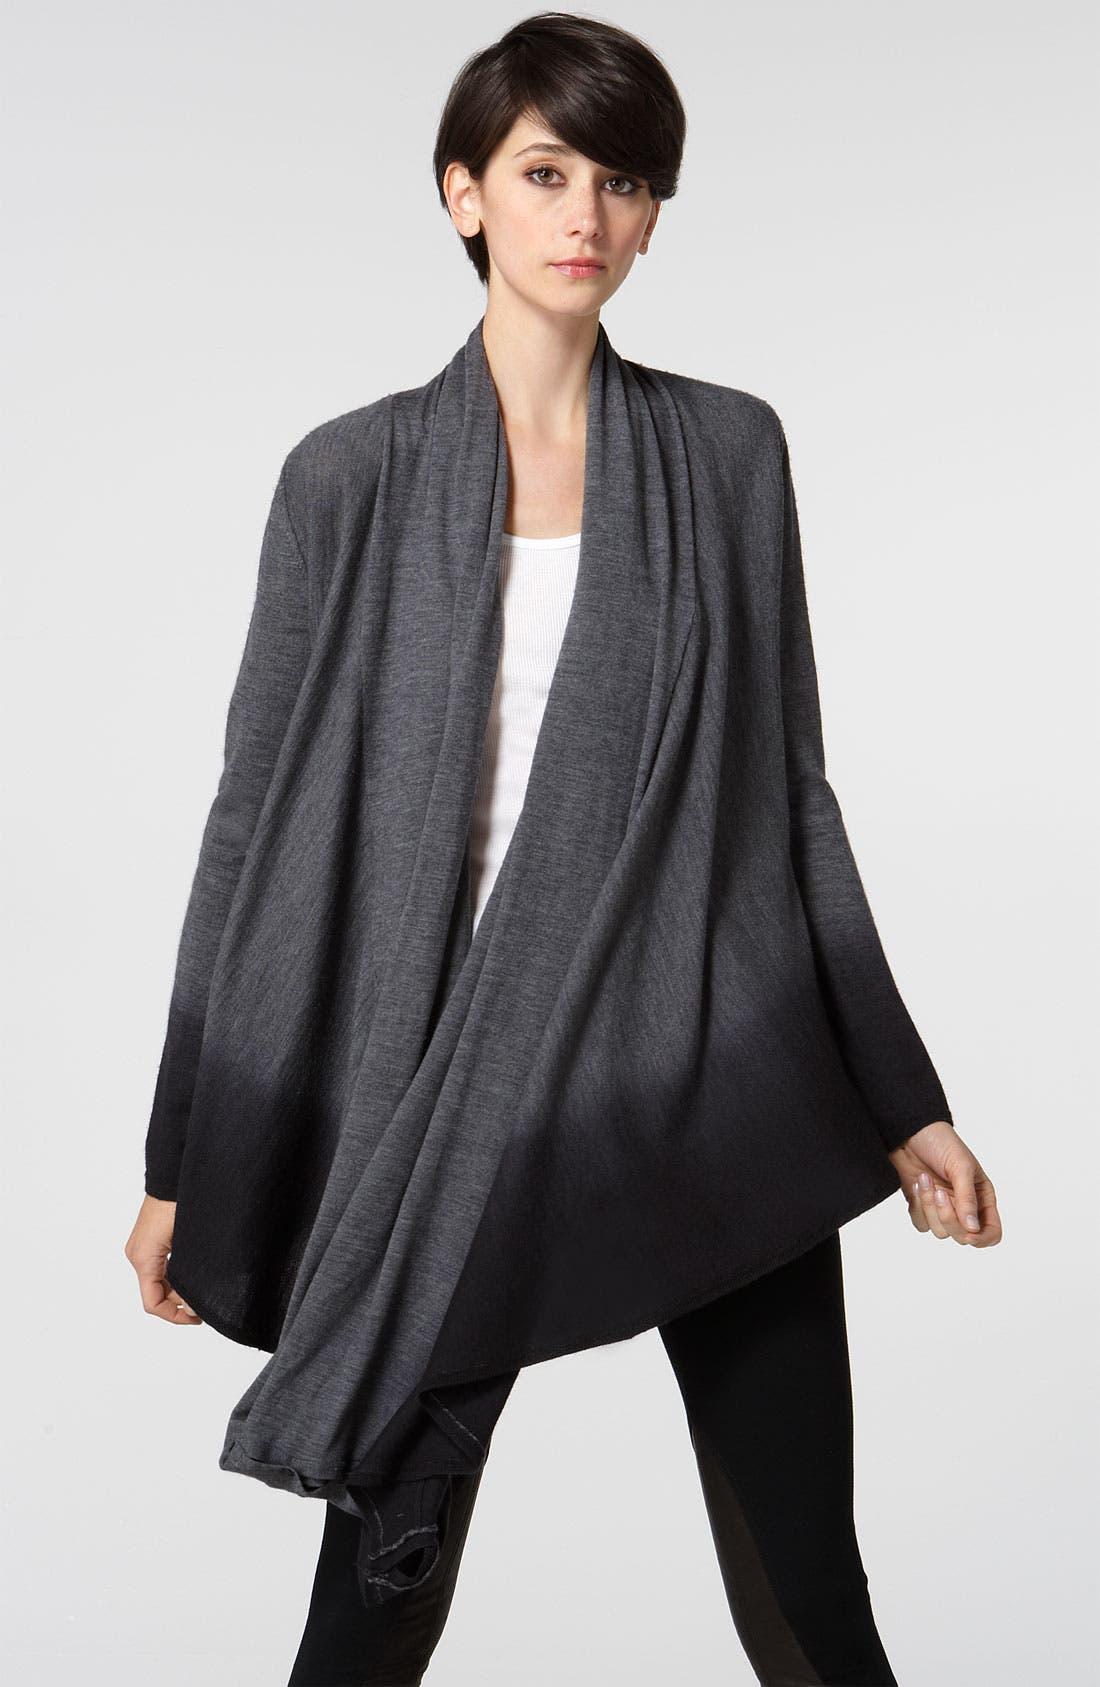 Alternate Image 1 Selected - Alice + Olivia Dip Dye Drape Sweater